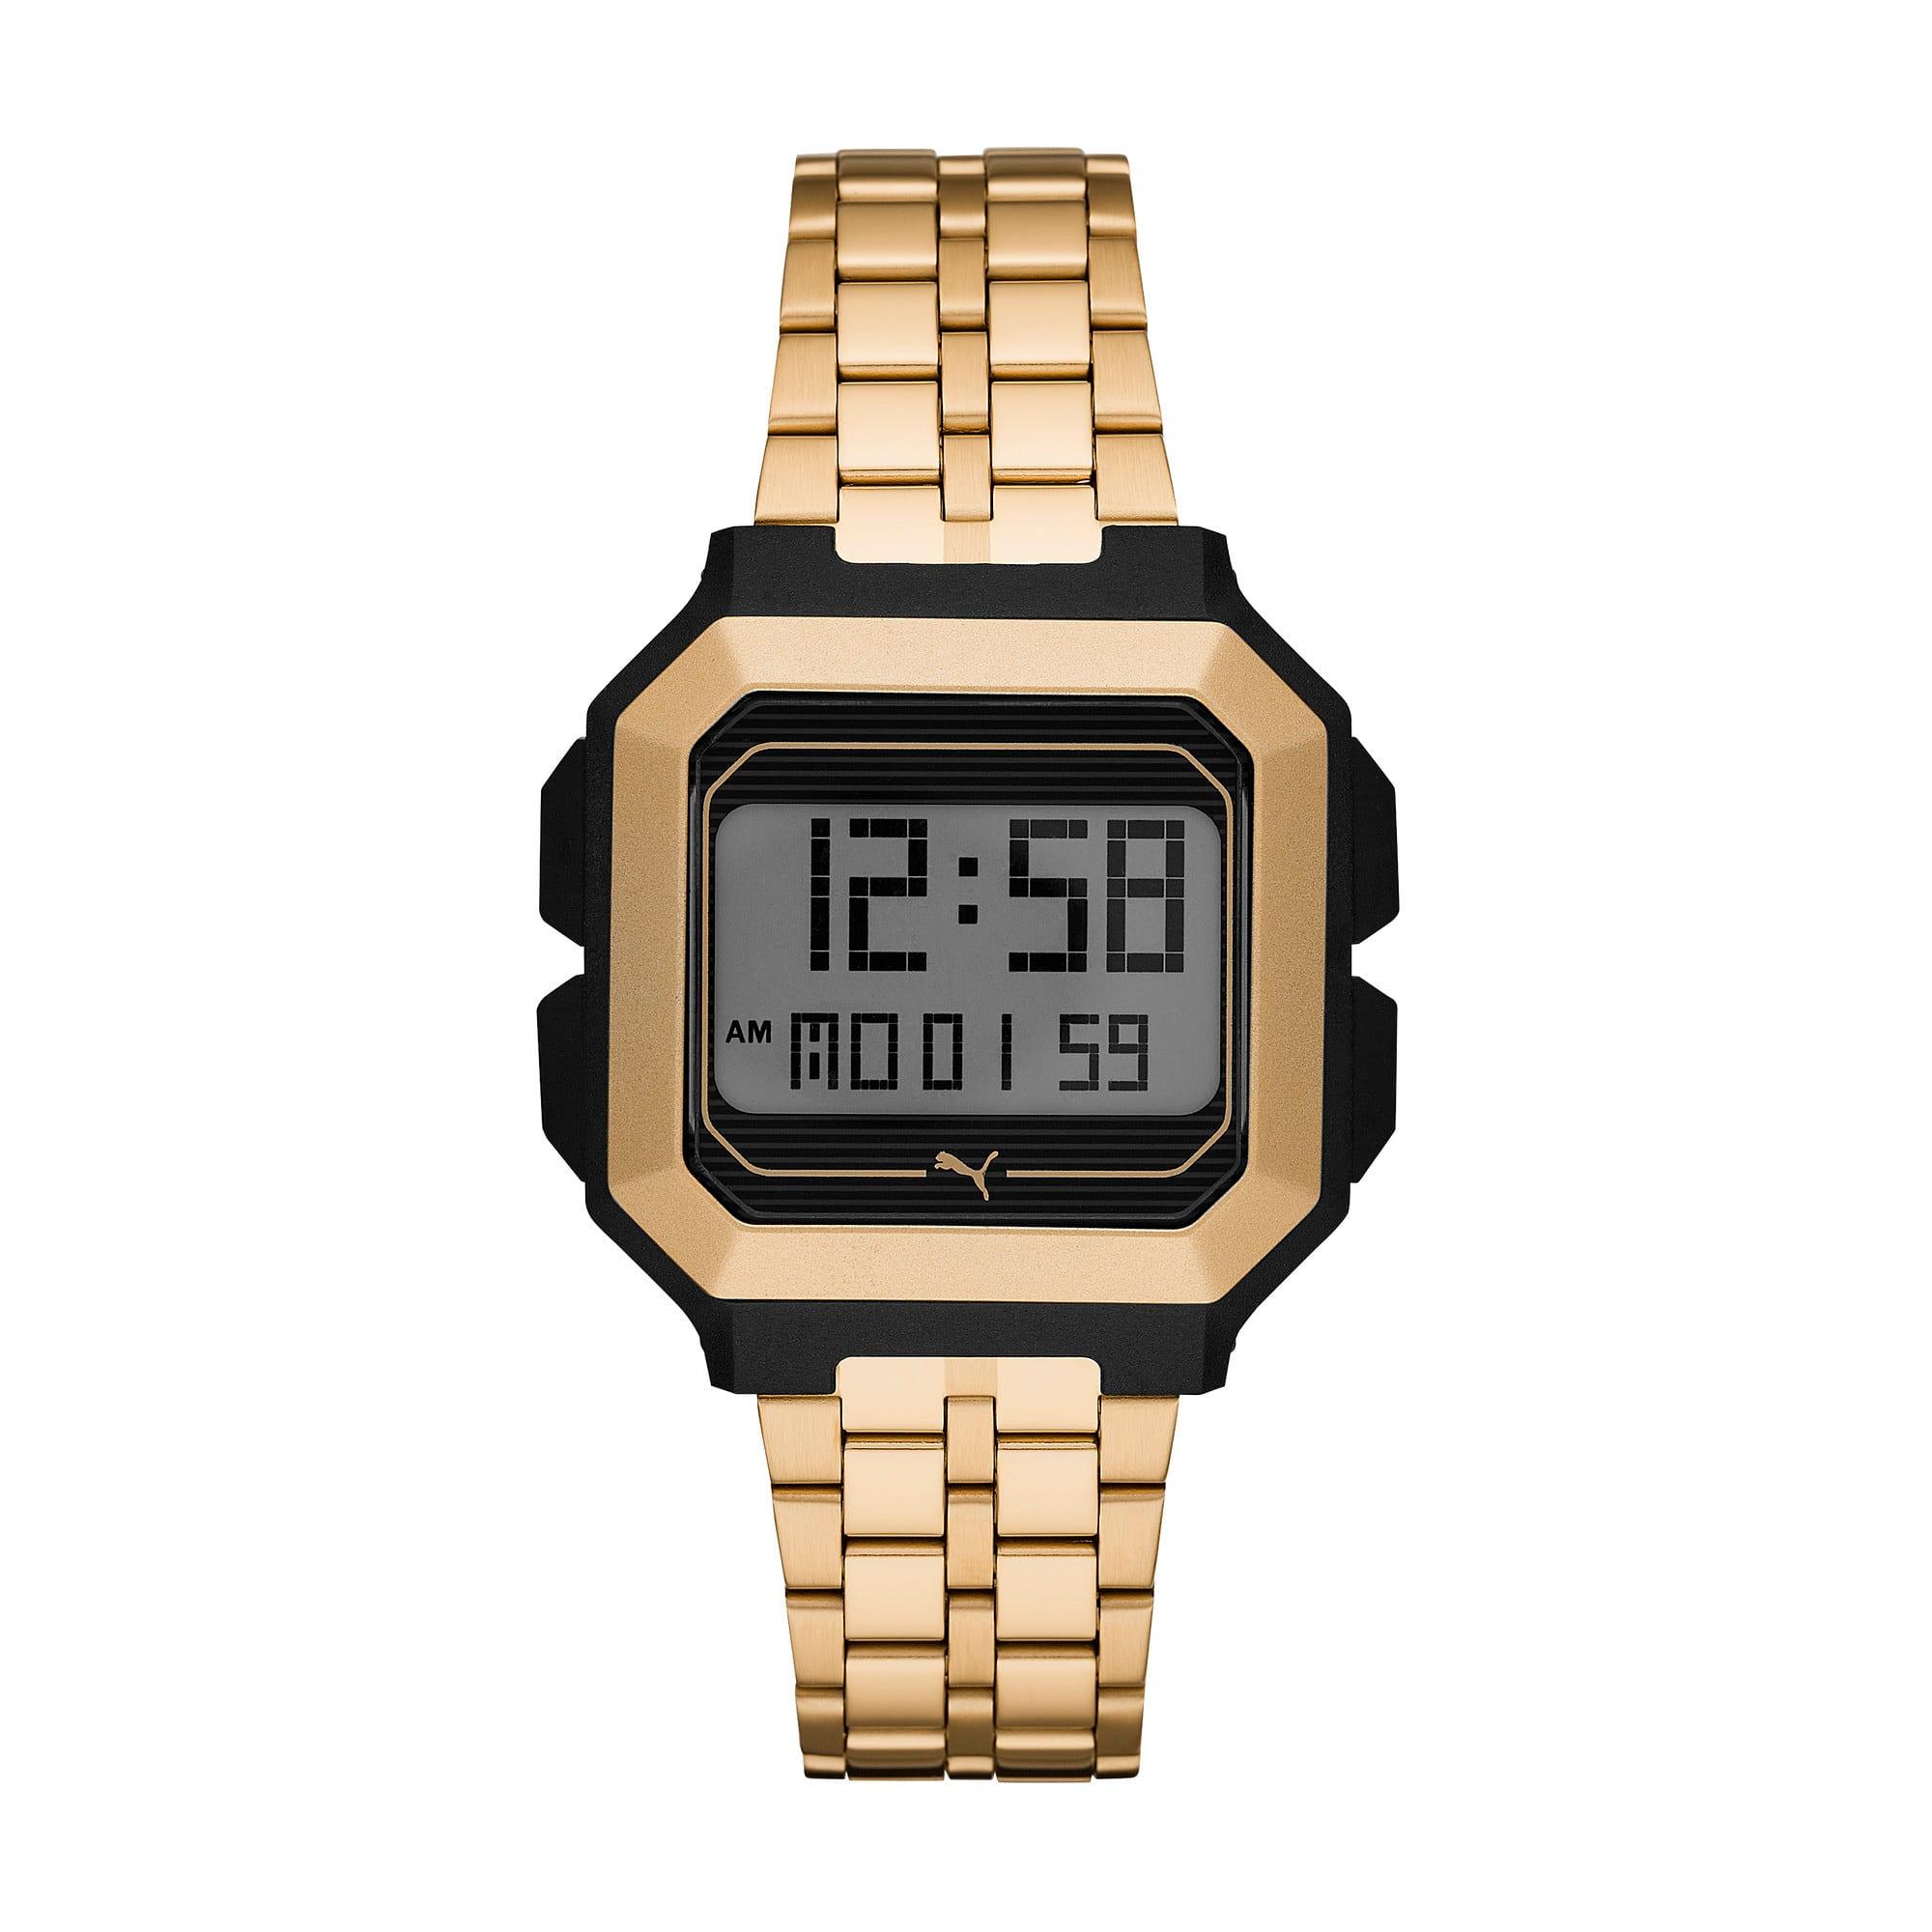 Thumbnail 1 of Remix Gold Stainless Steel Digital Watch, Gold/Black, medium